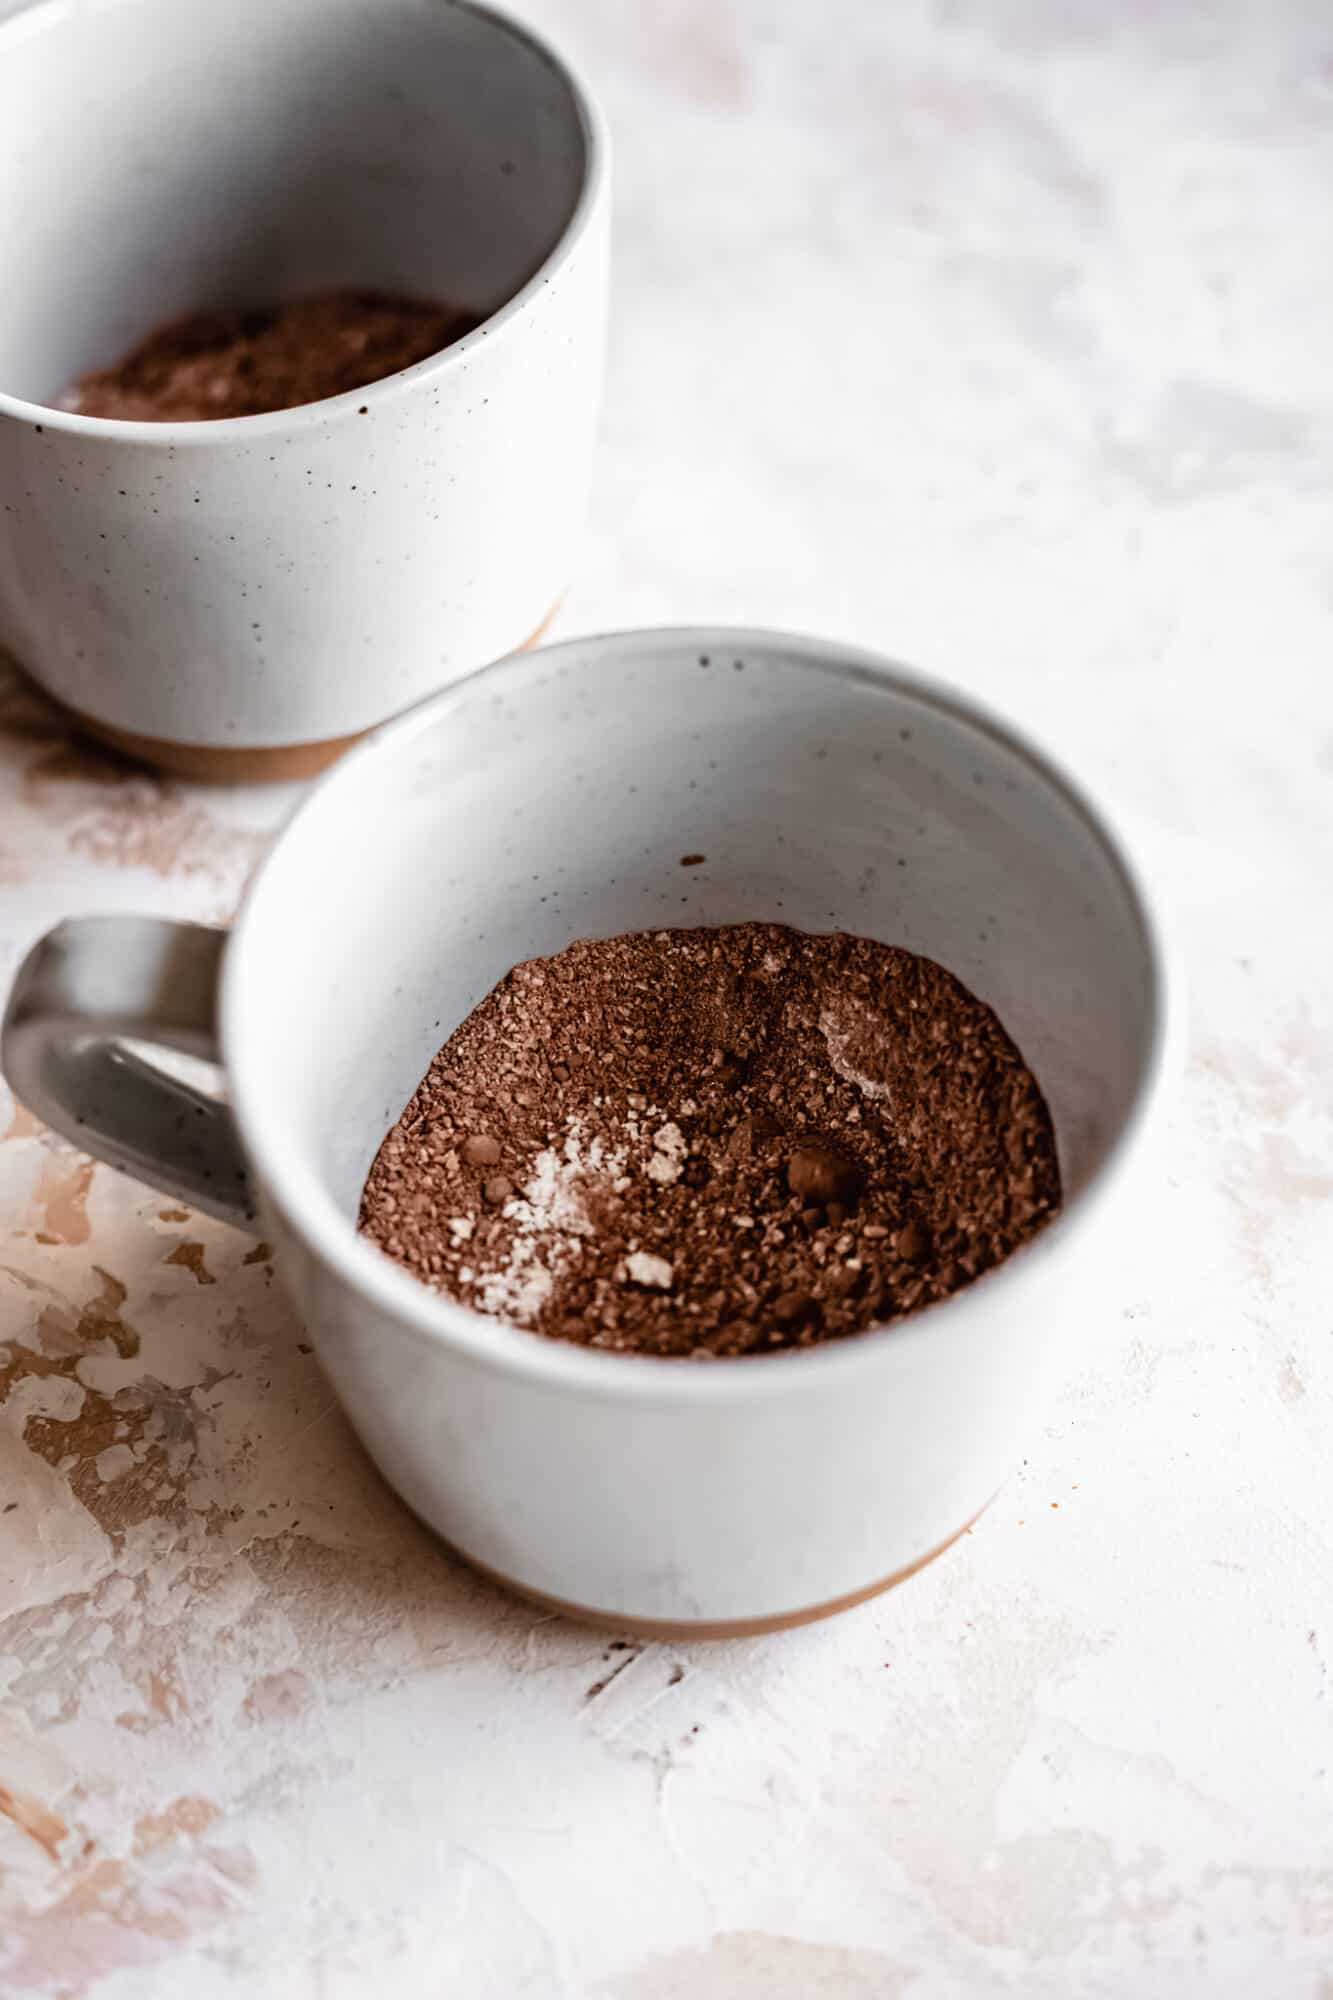 dry ingredients for healthy chocolate mug cake in mug